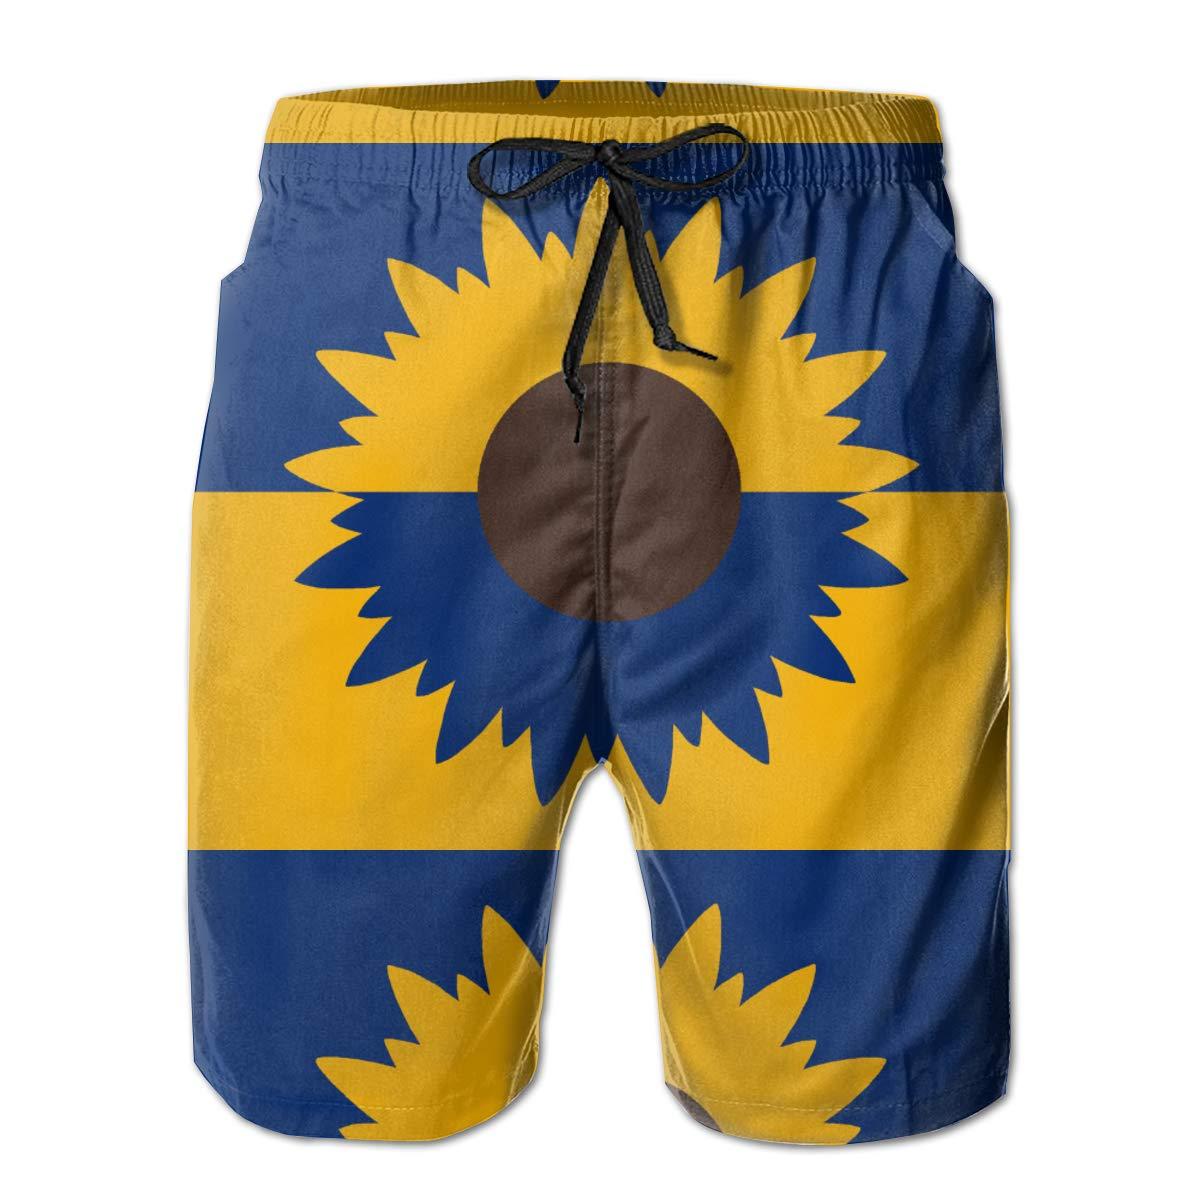 Galaxy Voyage Kansas Flag Boy Men S Swim Trunks Surf Pants 3D Swimming Trunks Board Shorts for Men